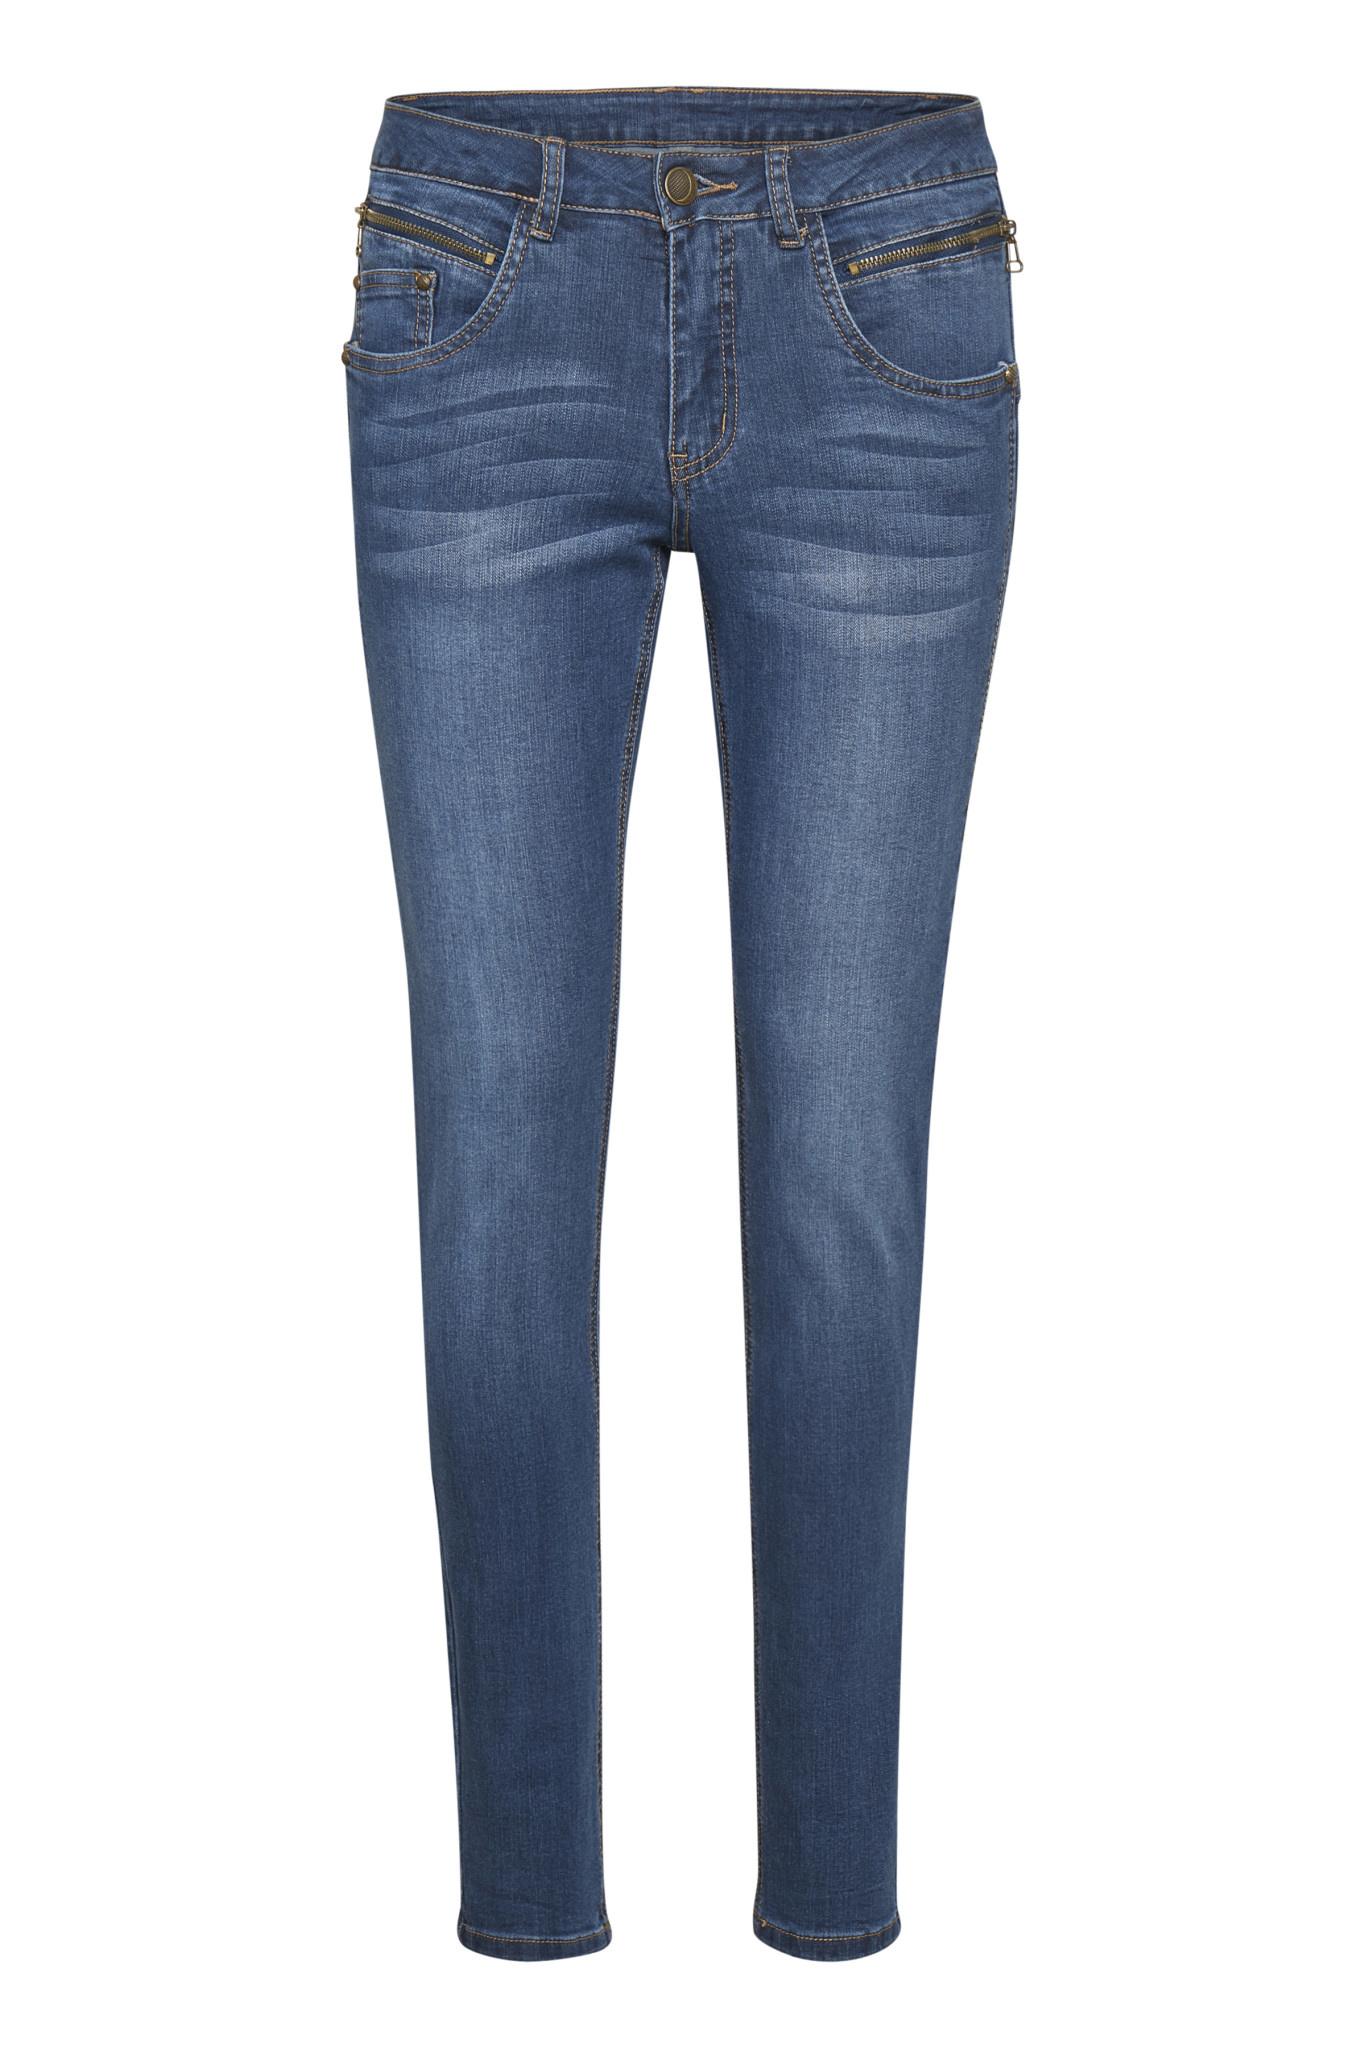 Ukora Jeans